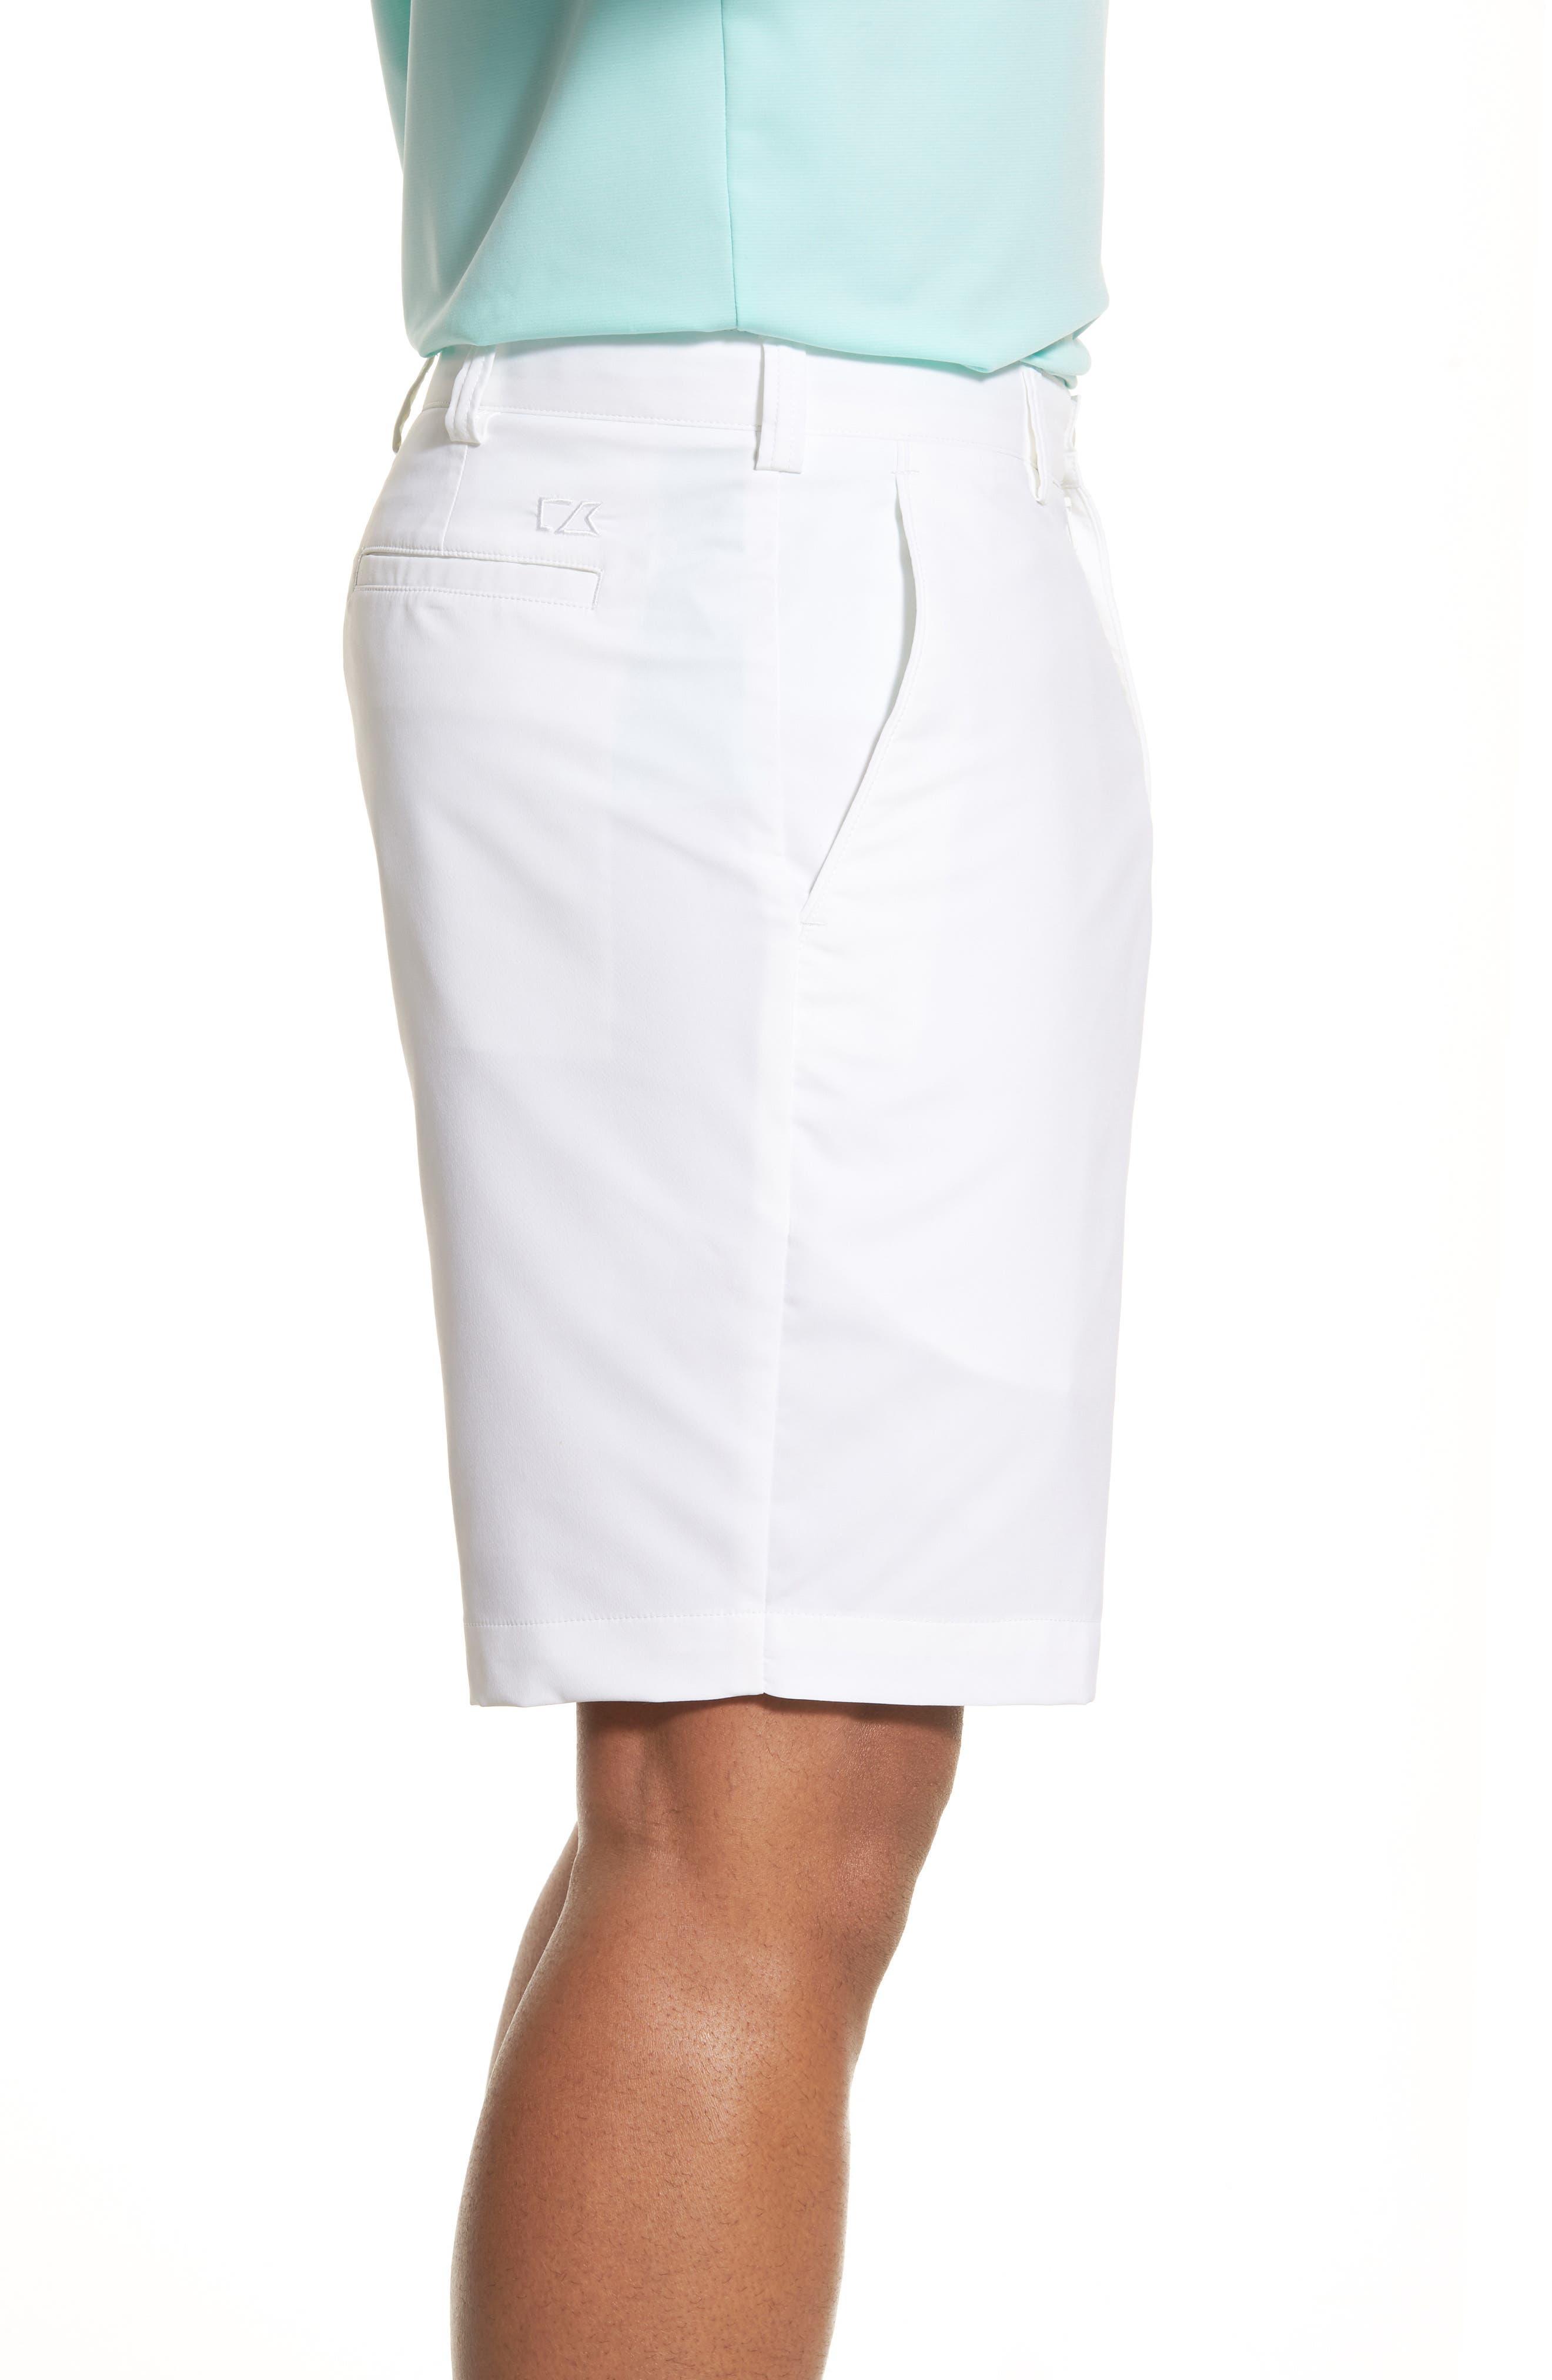 Bainbridge DryTec Flat Front Shorts,                             Alternate thumbnail 5, color,                             White